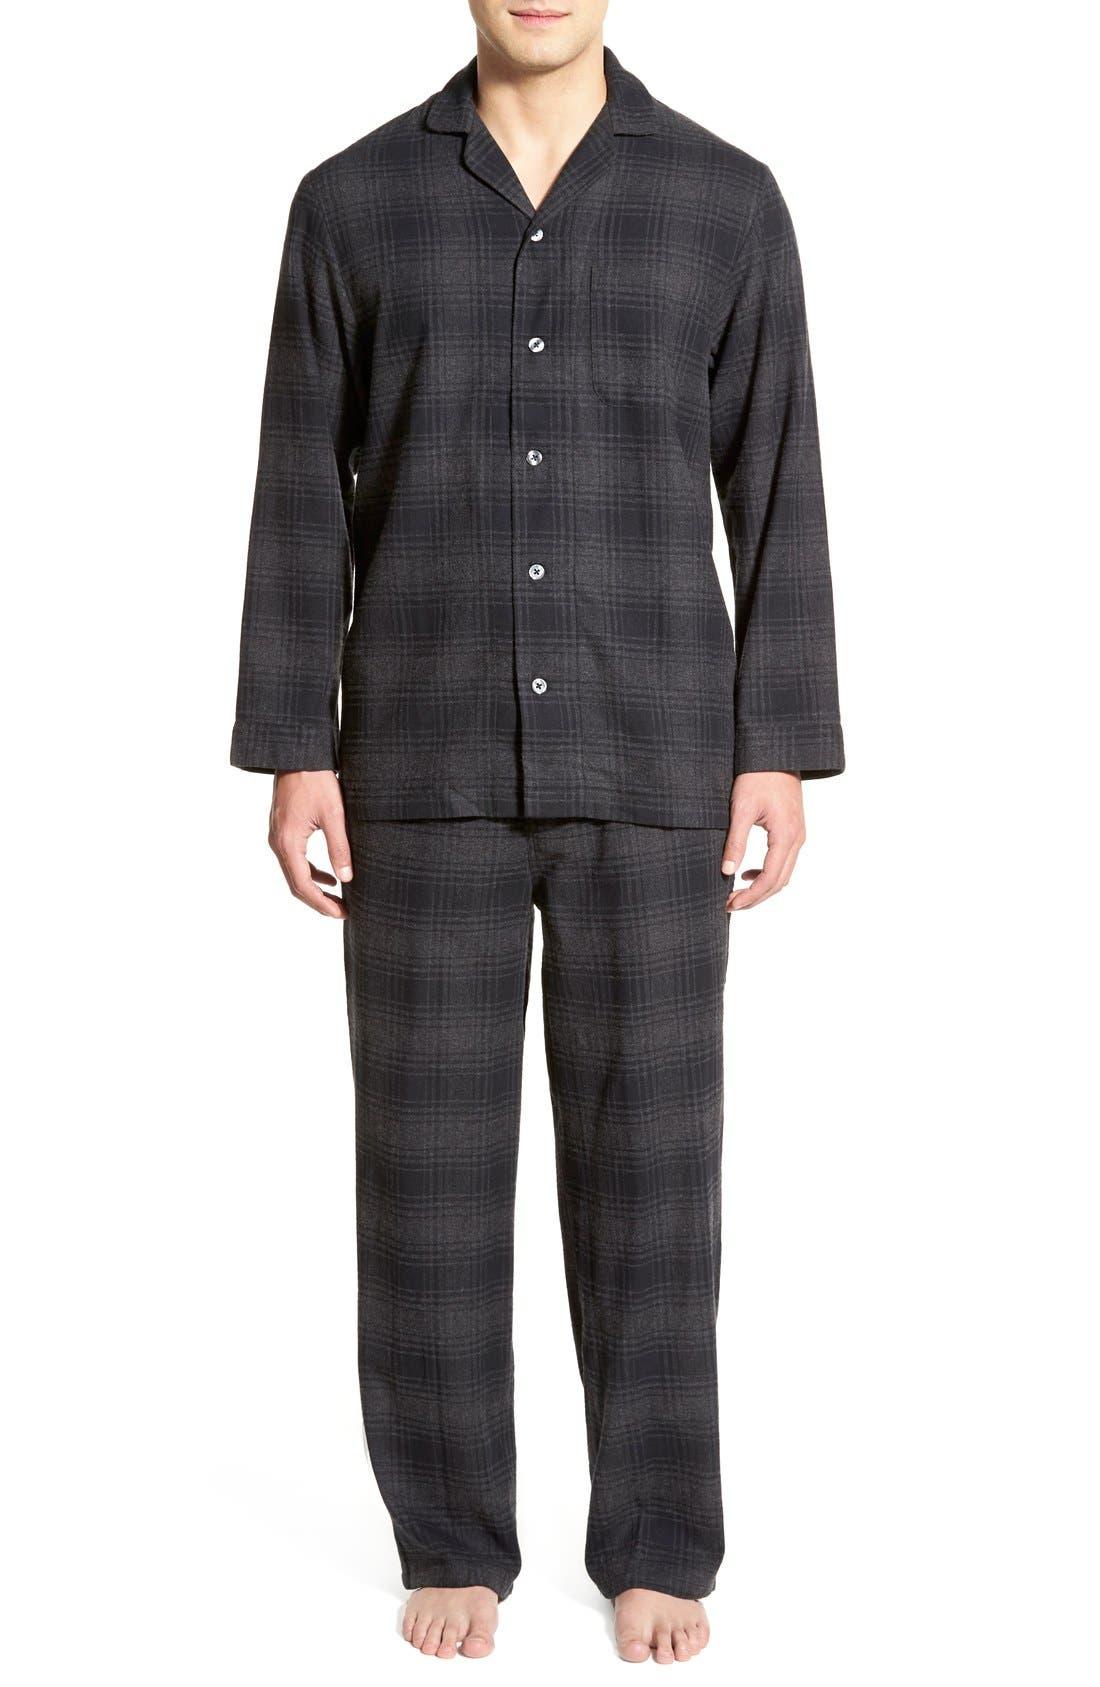 '824' Flannel Pajama Set,                             Main thumbnail 15, color,